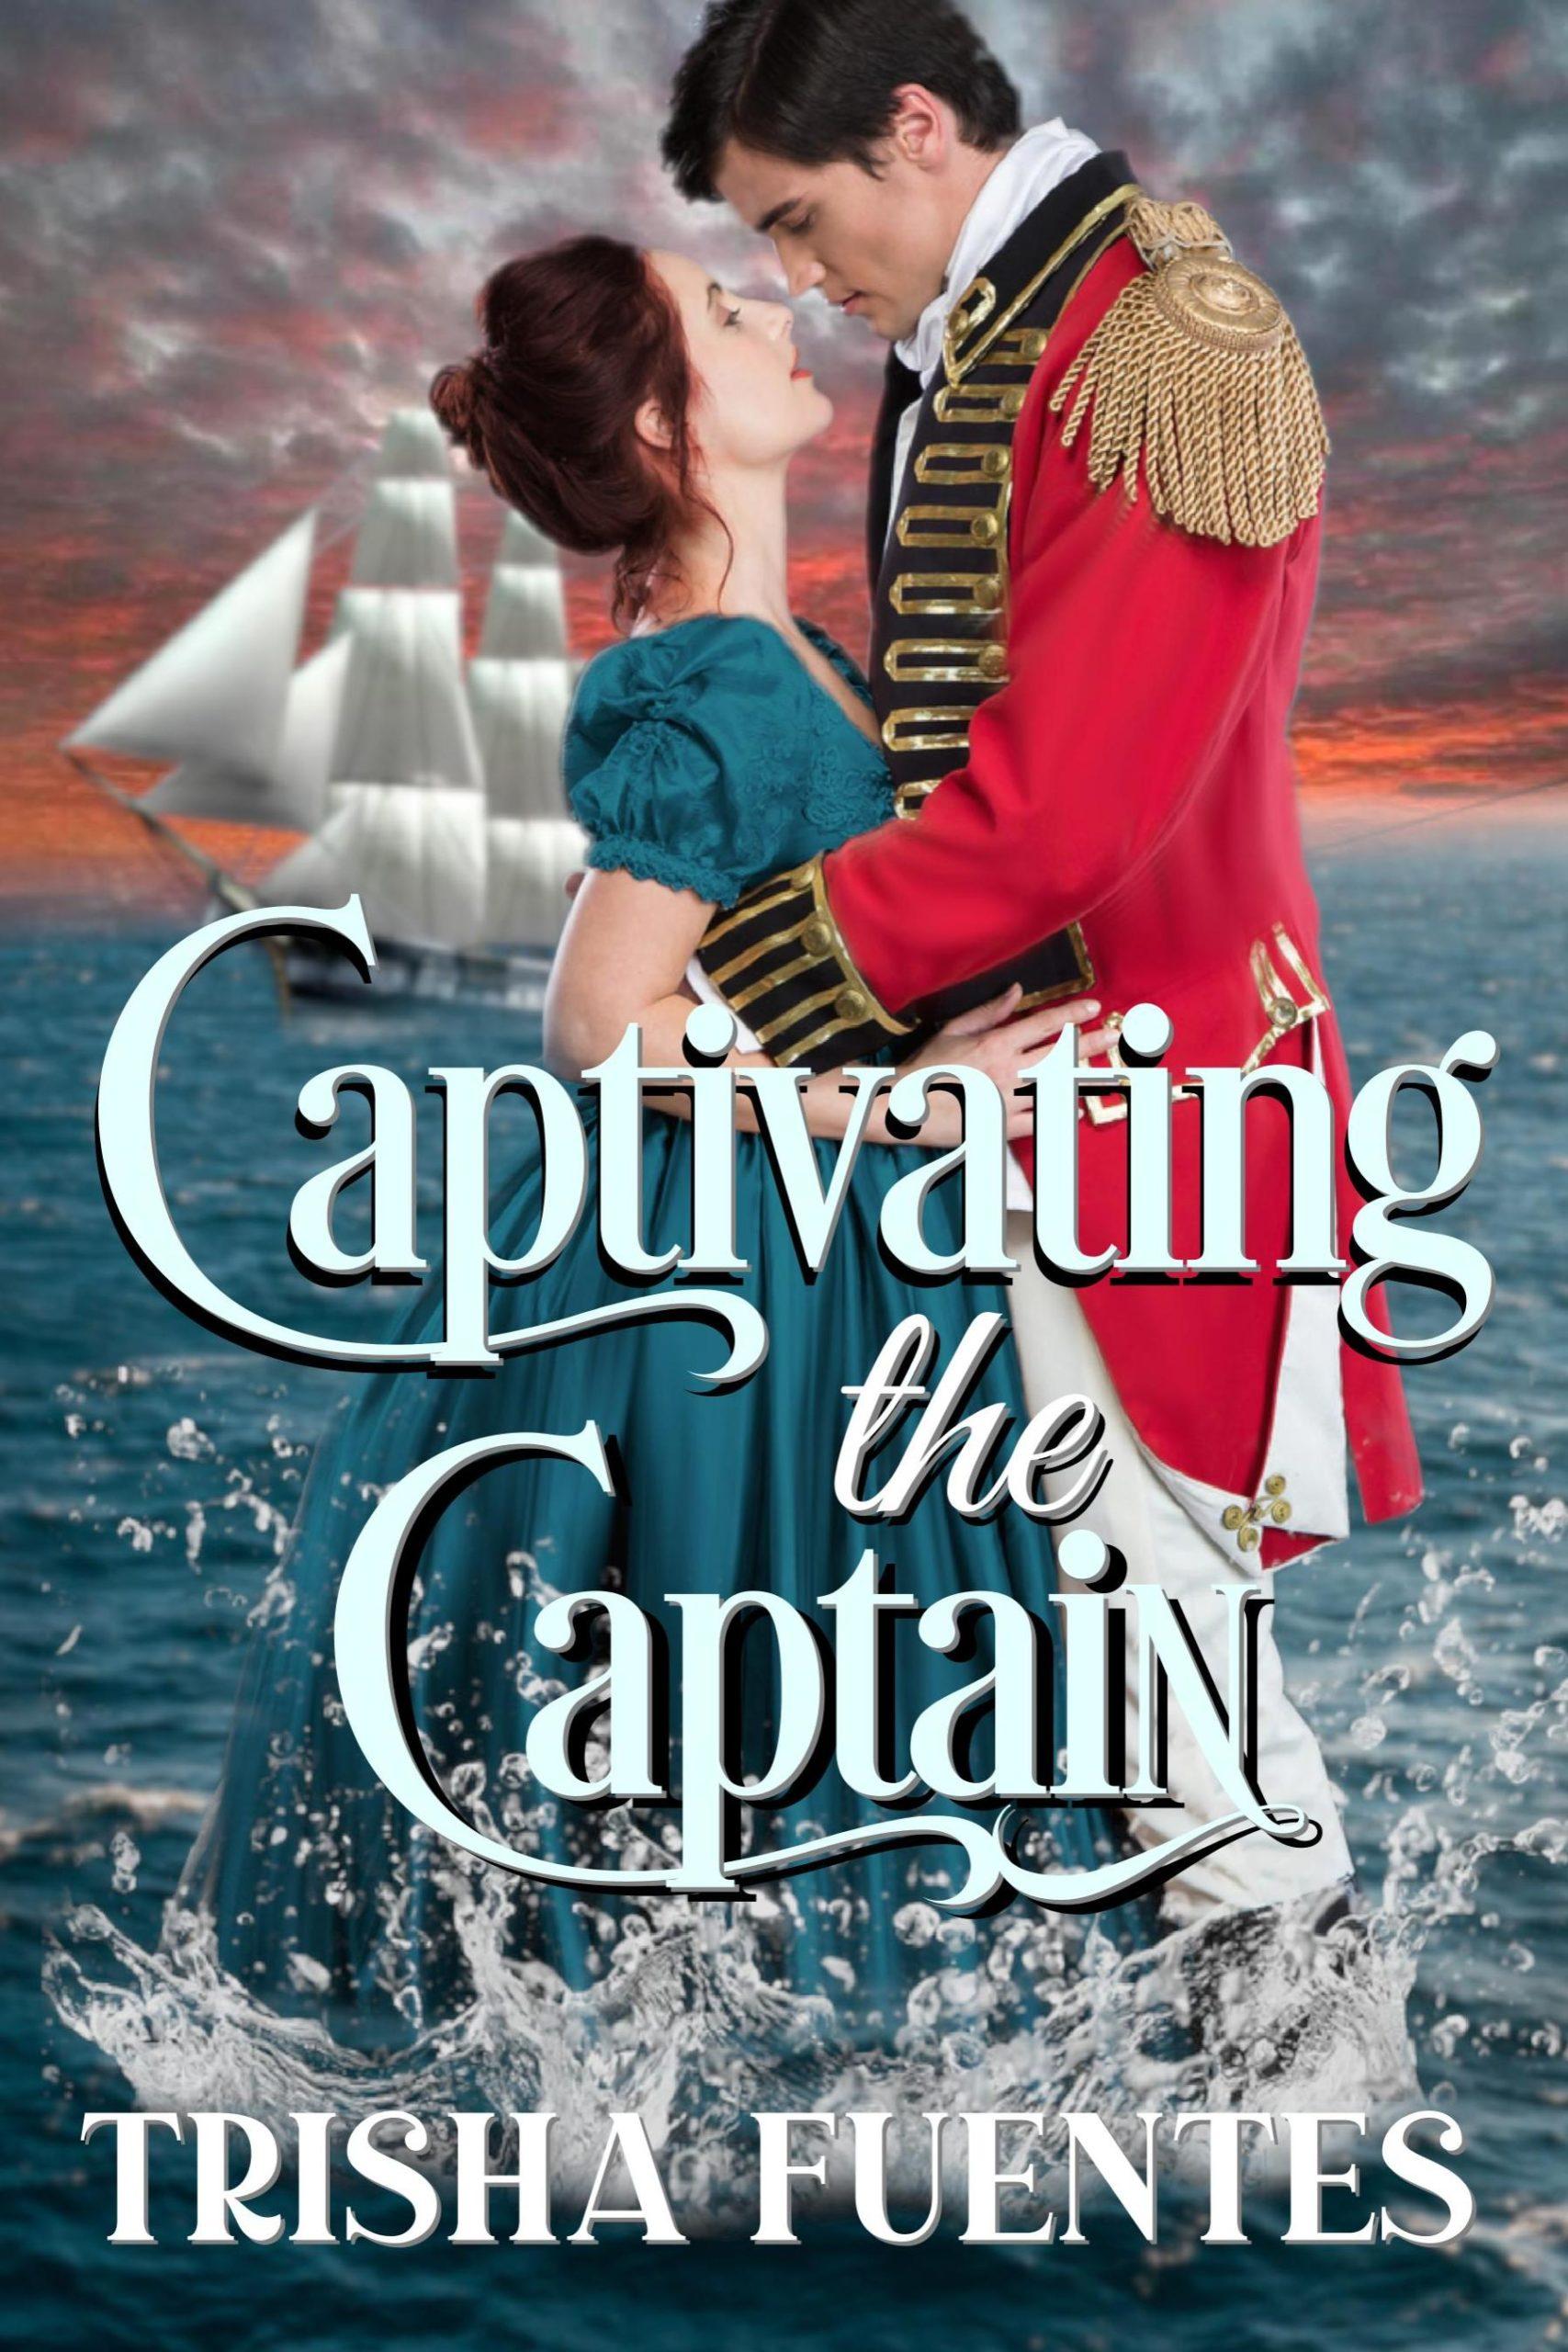 "<span itemprop=""name"">Captivating the Captain</span>"